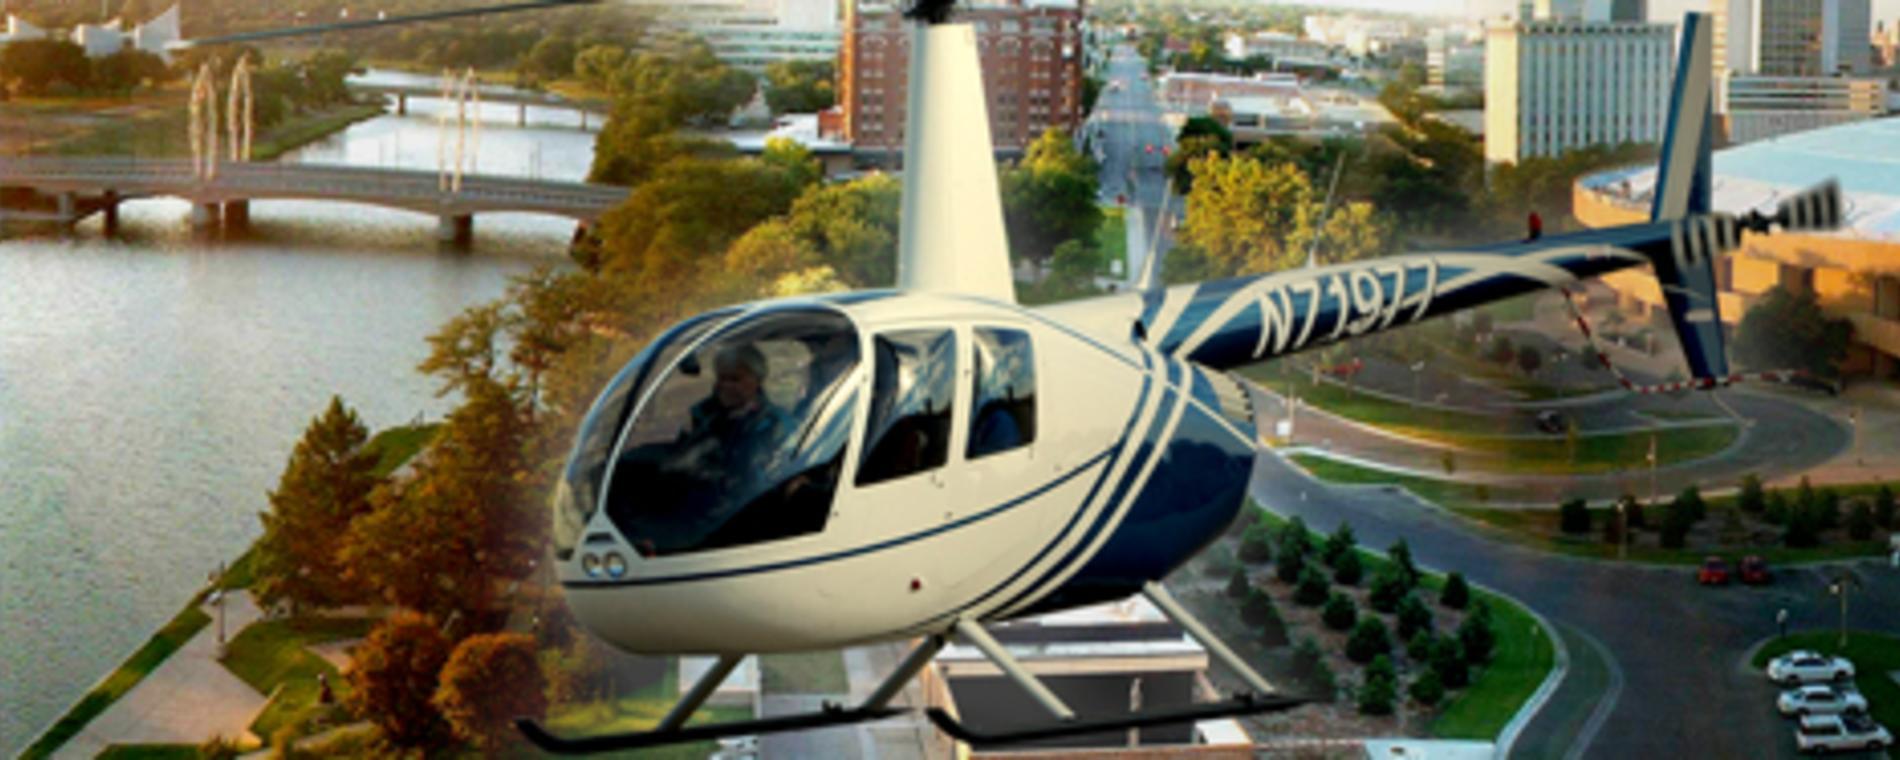 DWTA Helicoptor Over Wichita Visit Wichita